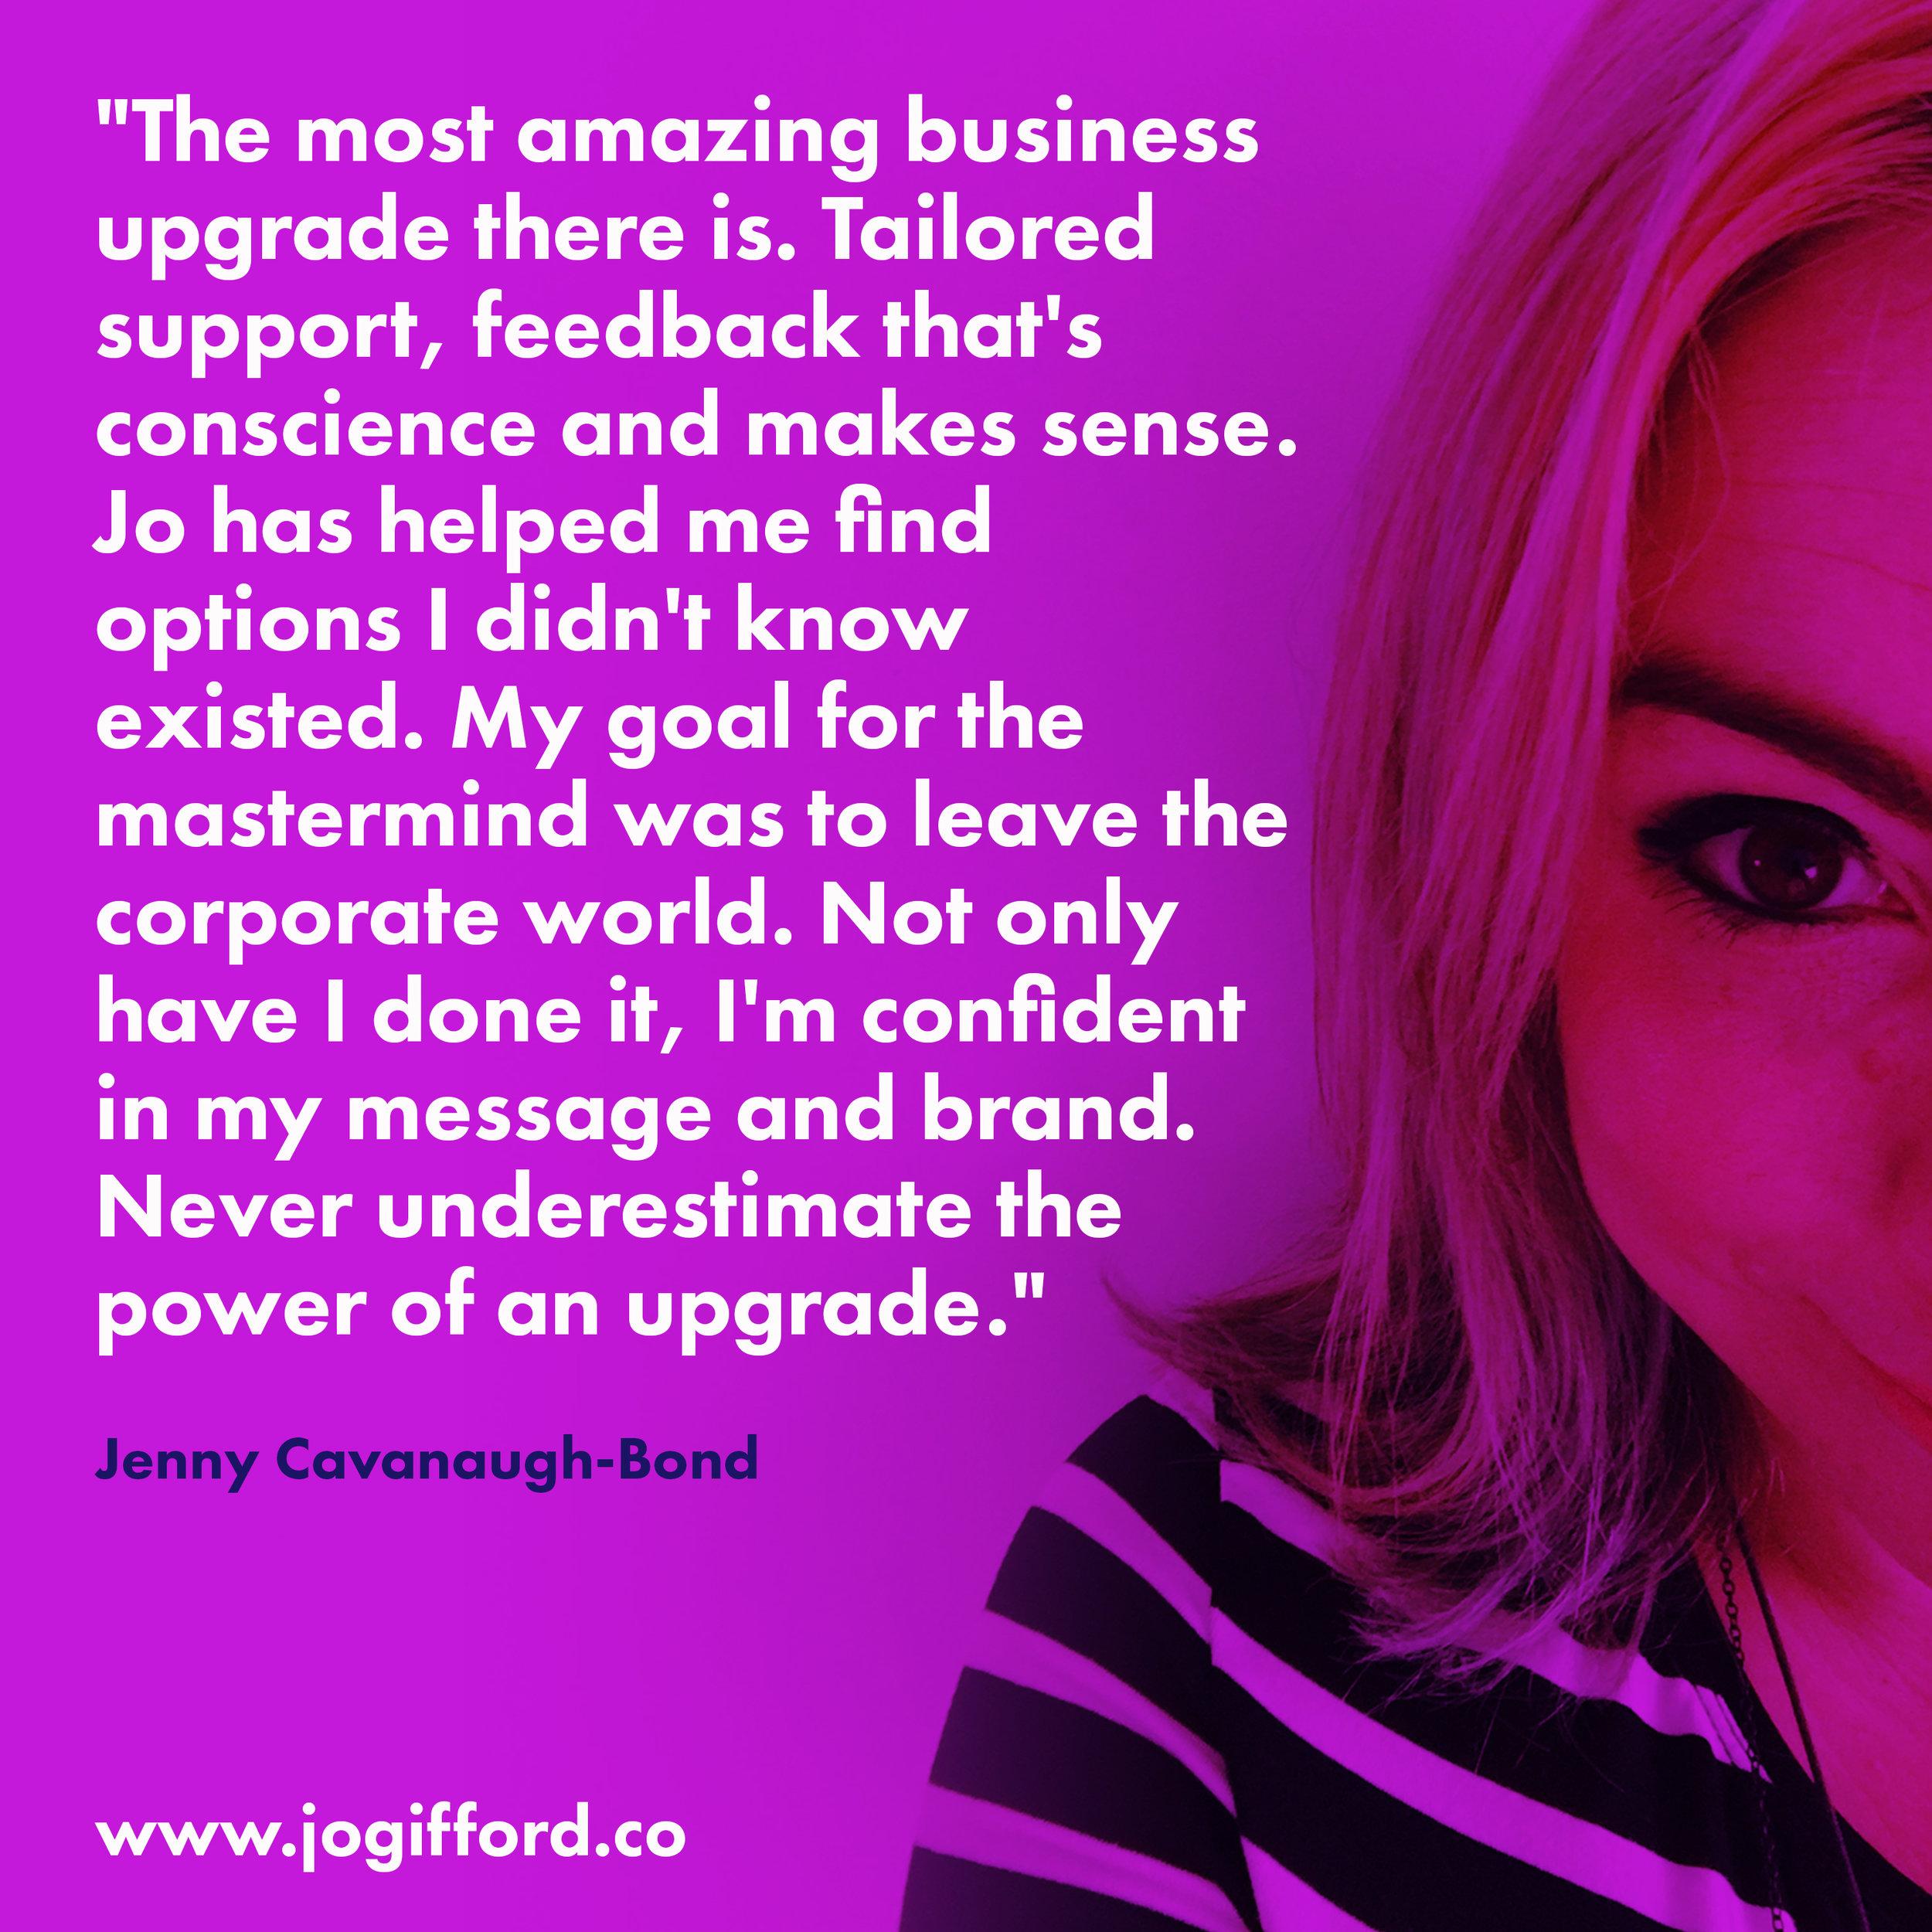 Testimonial-graphic-Jenny Cavanaugh-Bond.jpg